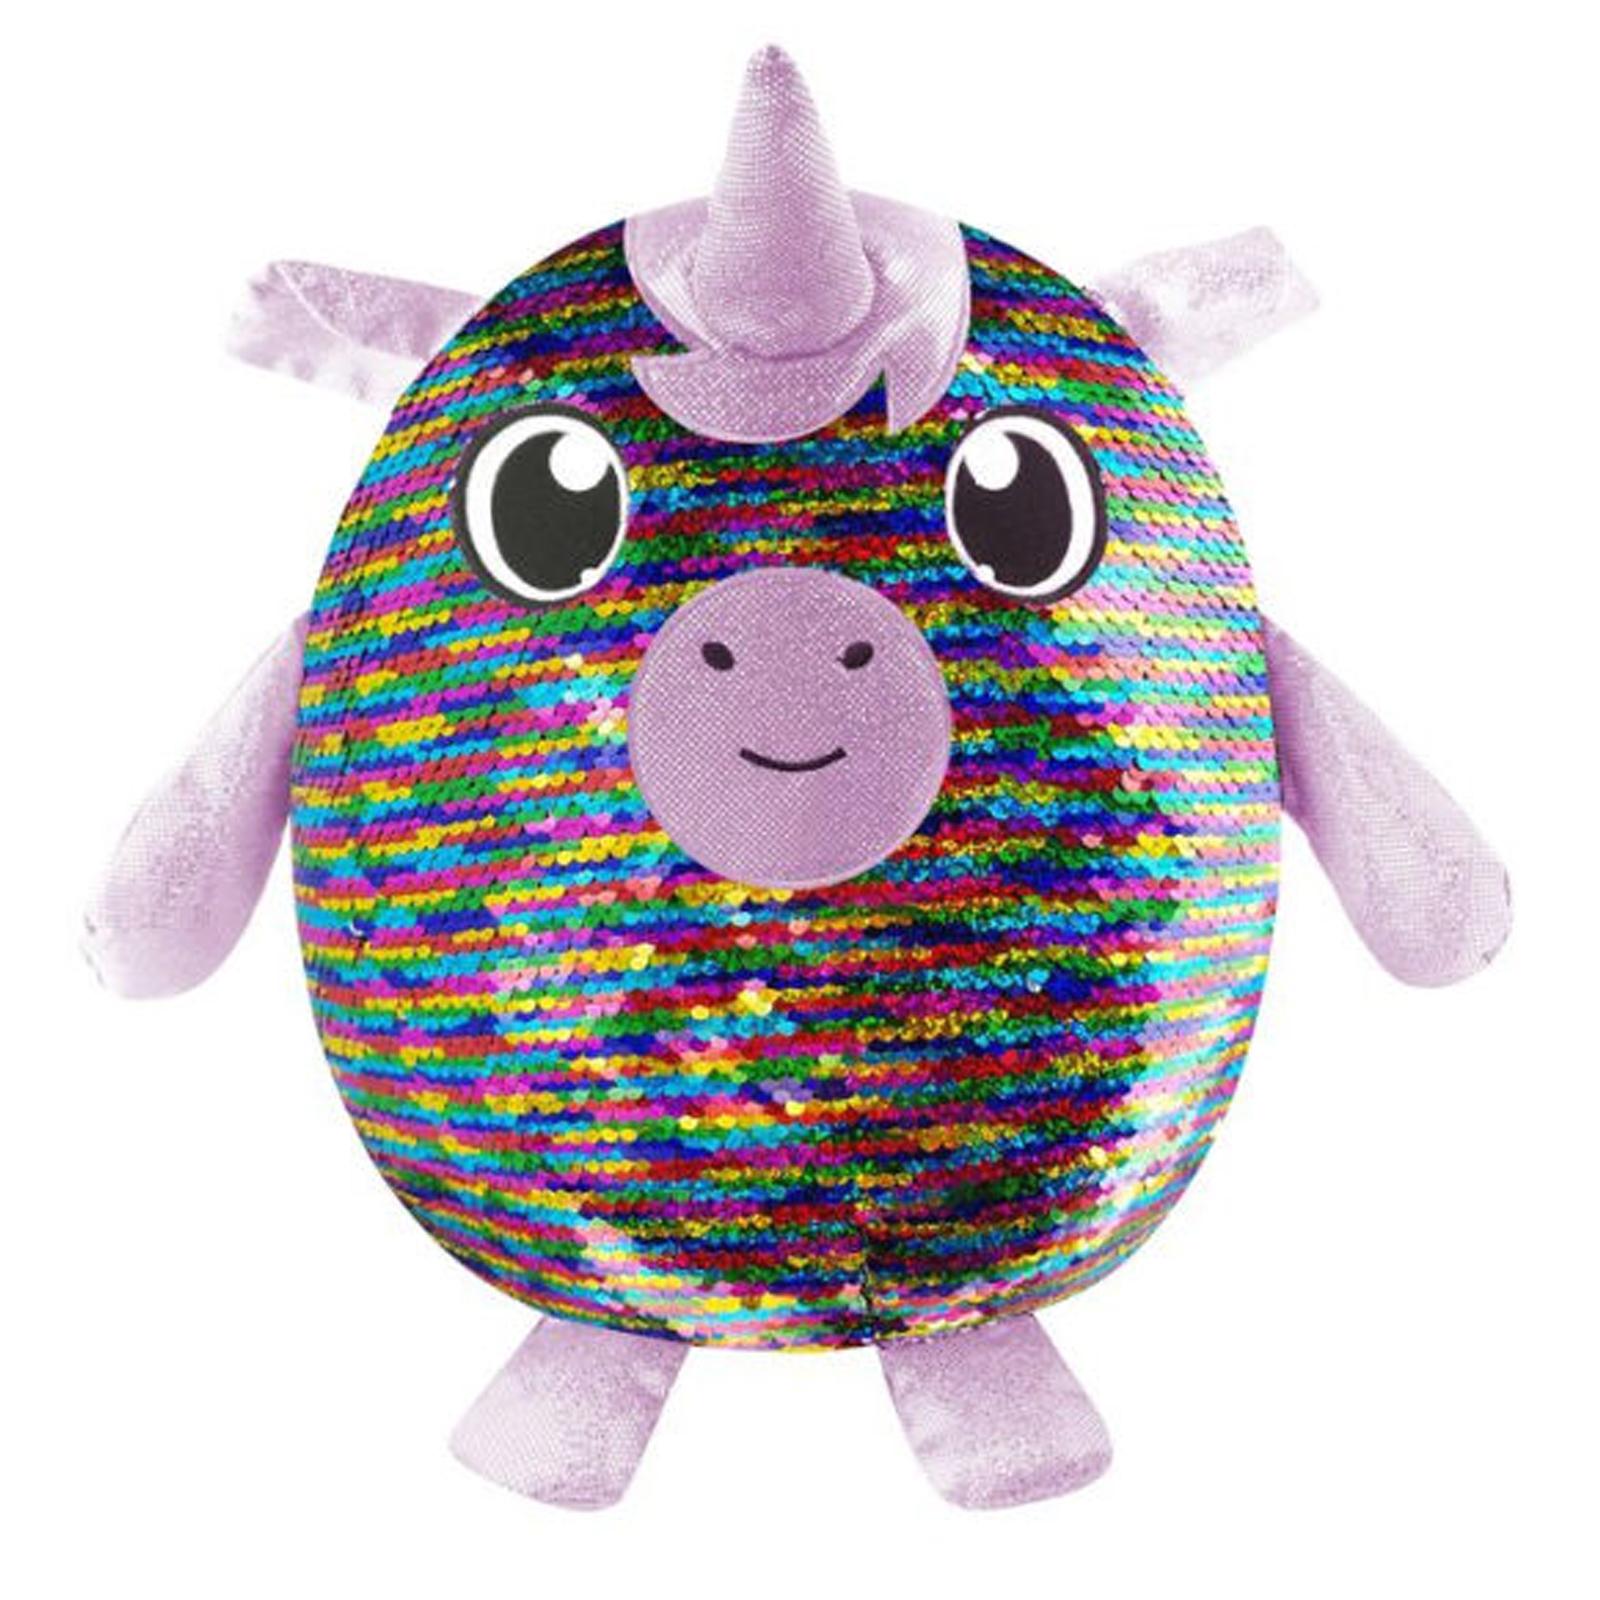 "Shimmeez 8"" Maggie Unicorn Reversible Sequin Plush Stuffed Animal"